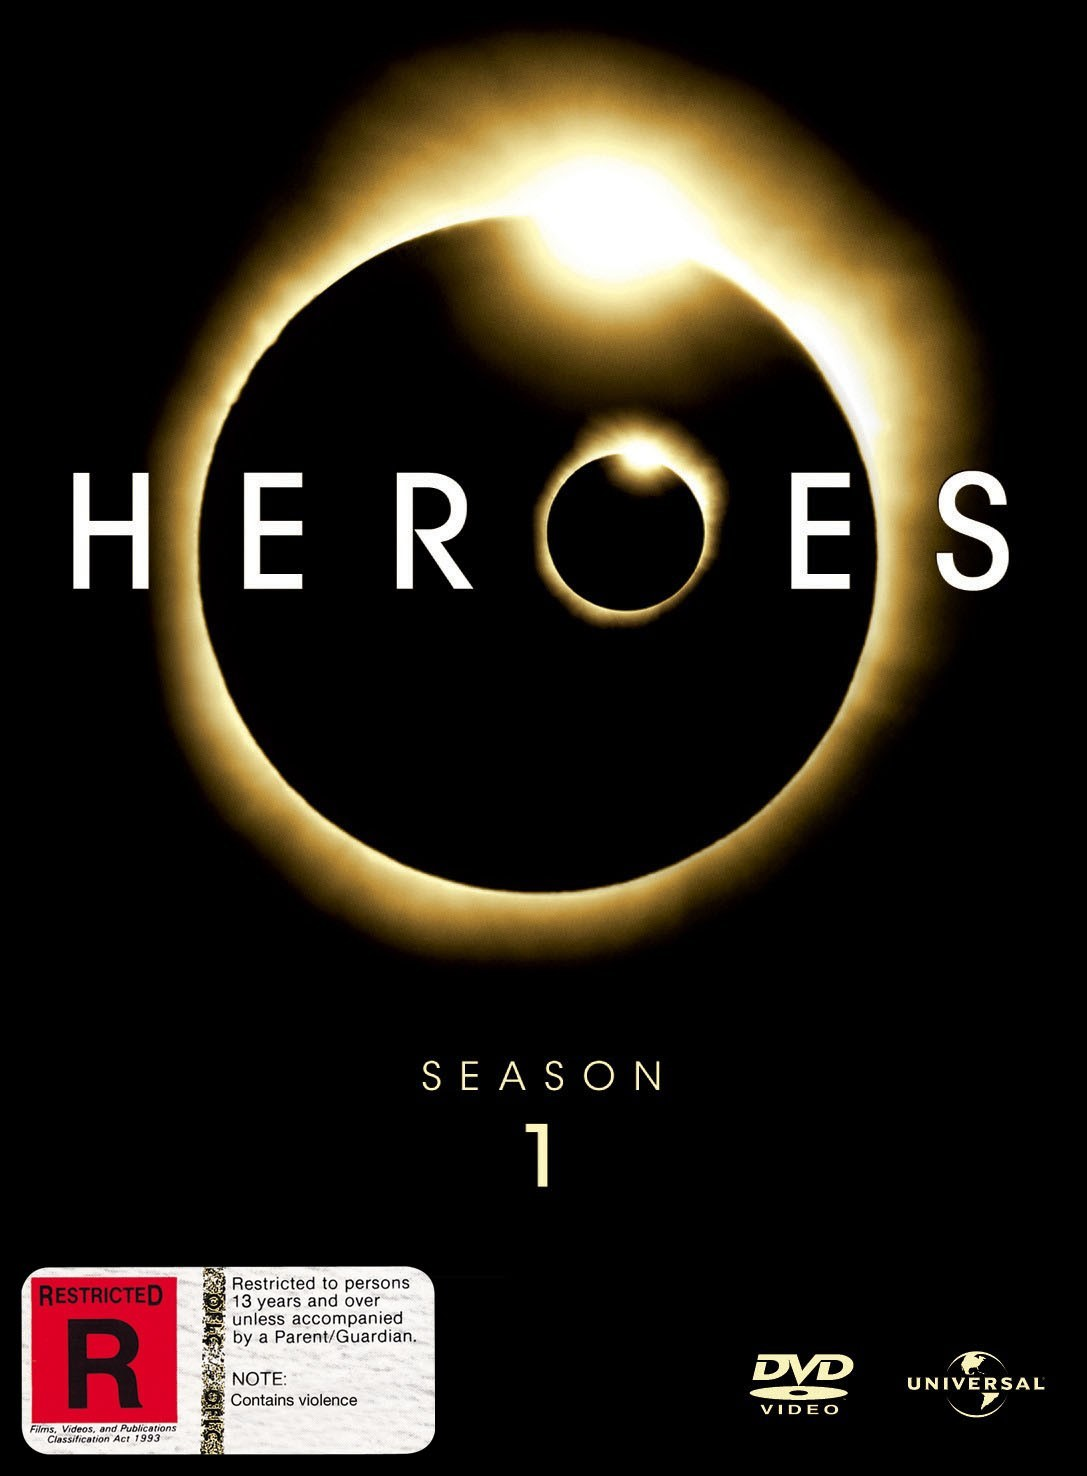 Heroes - Season 1 (7 Disc Box Set) Digipak on DVD image